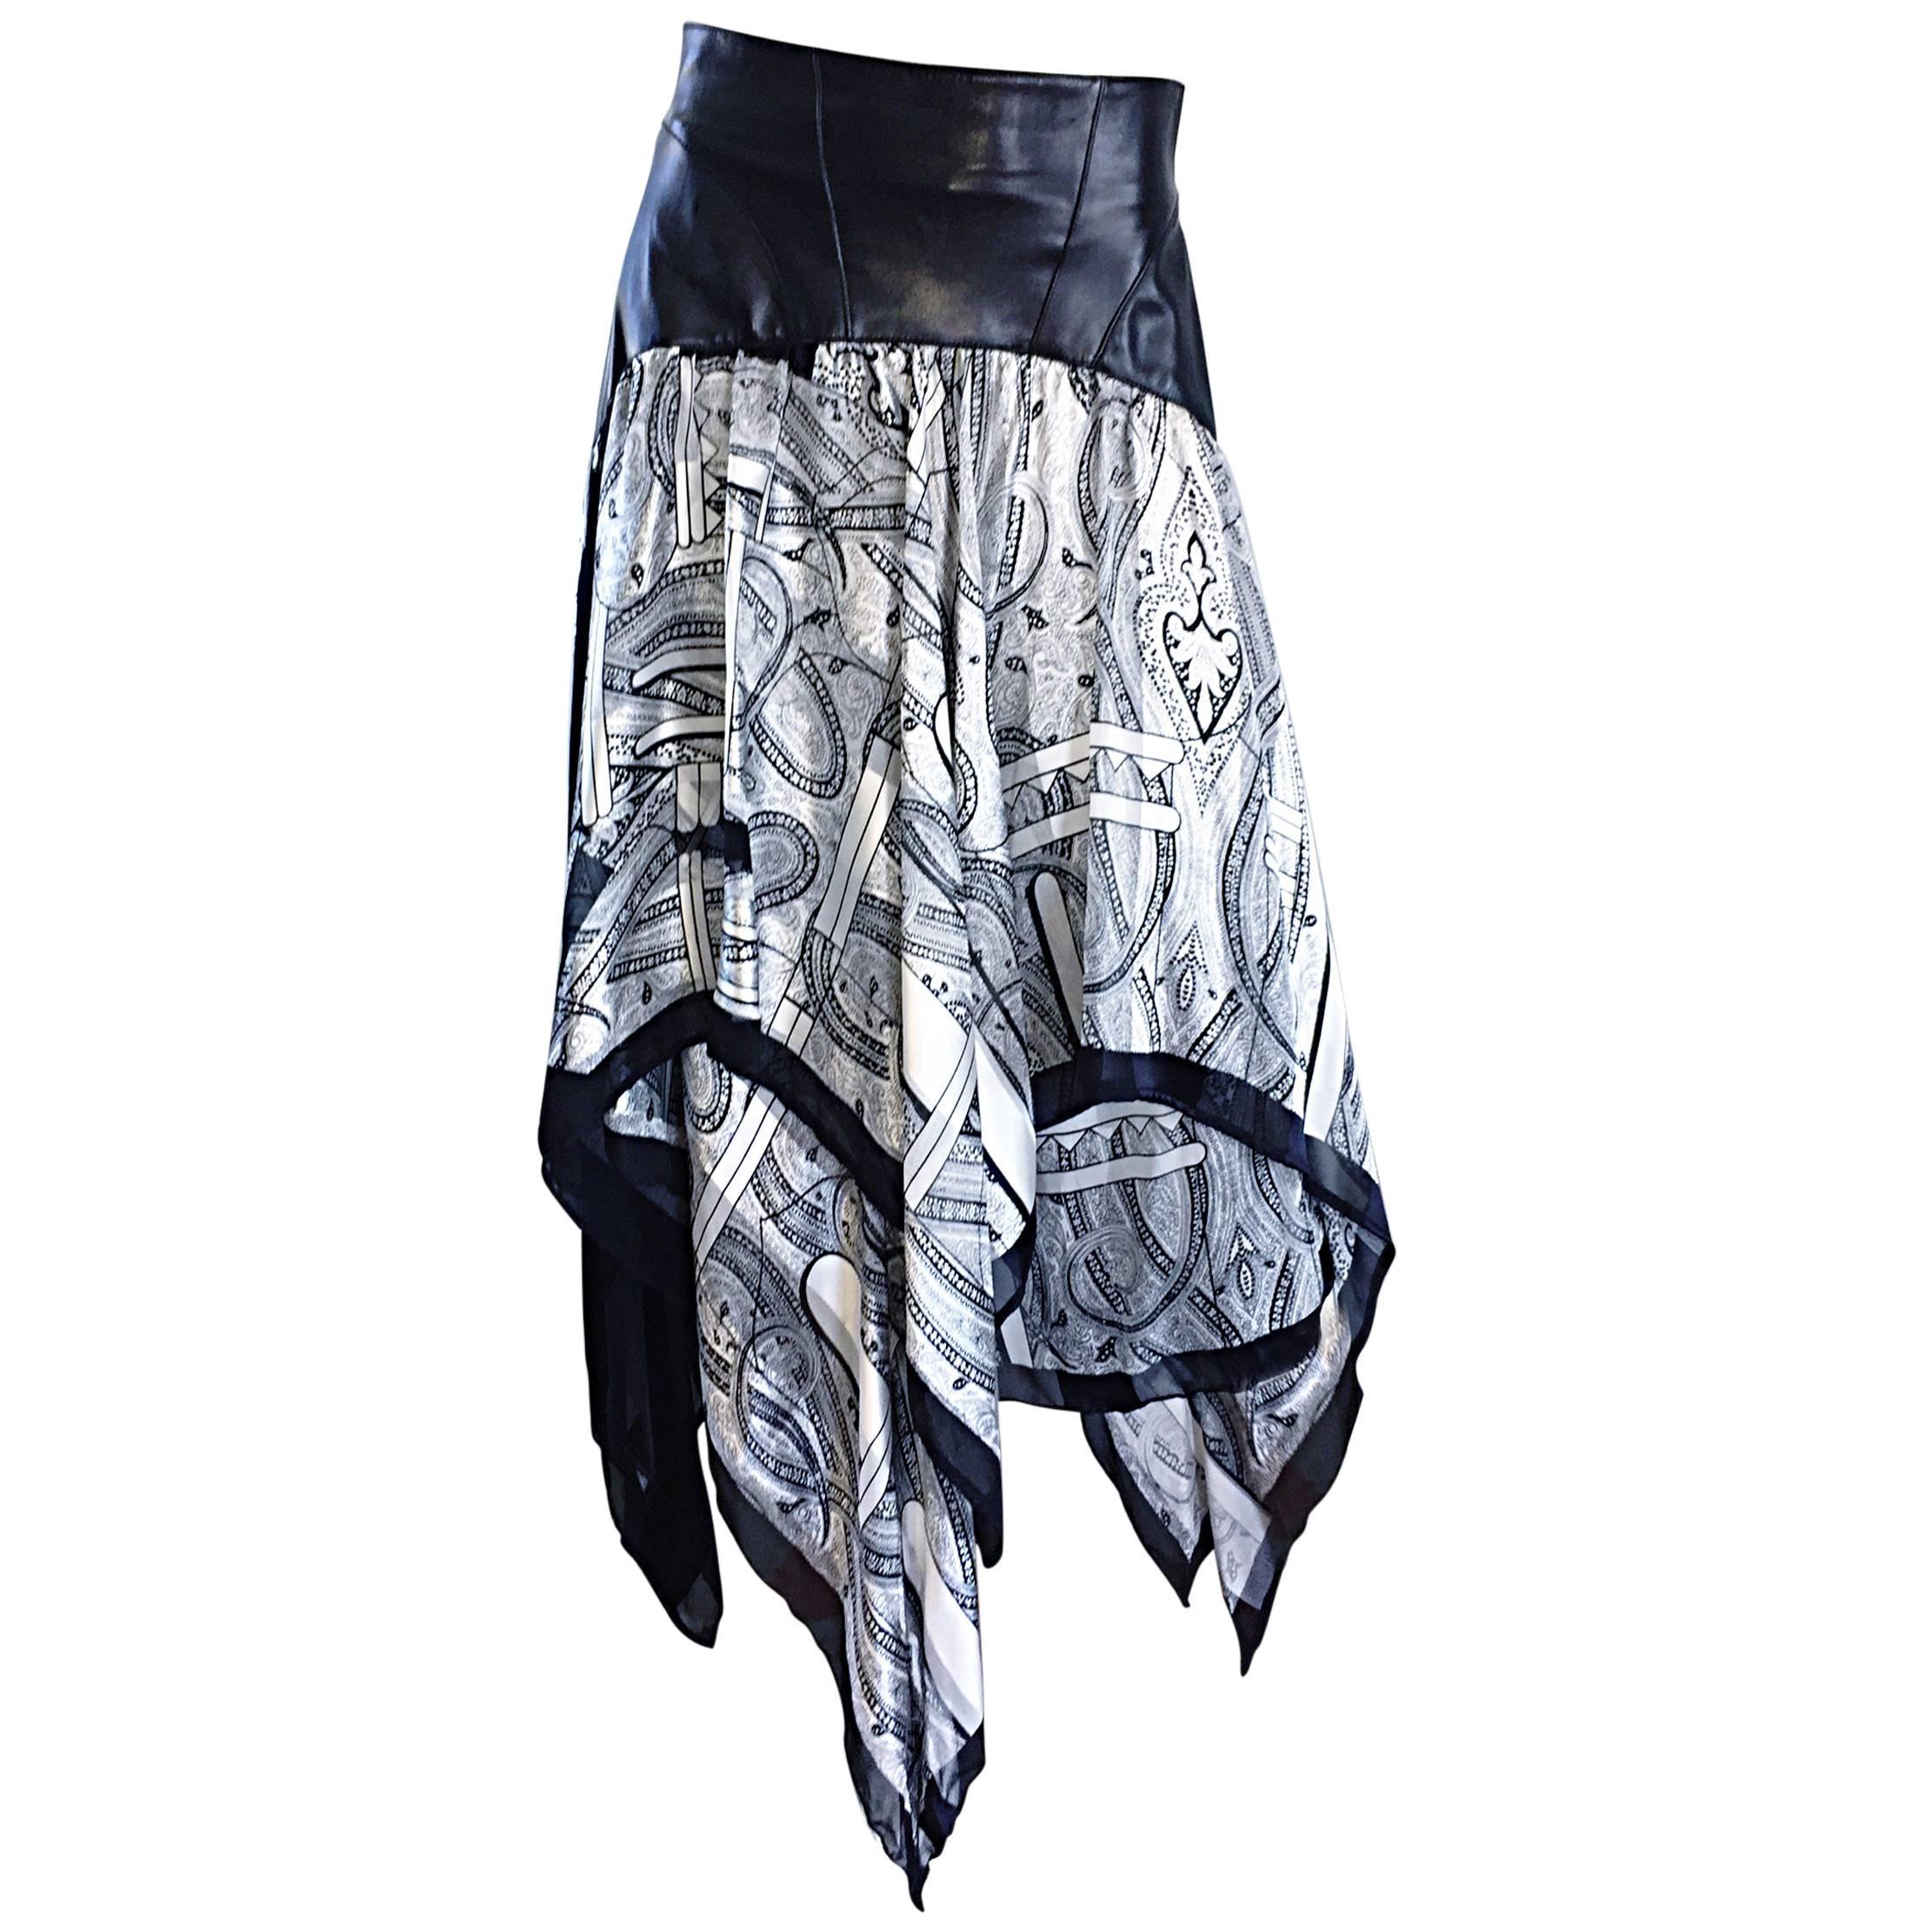 Vintage Jean Claude Jitrois Black and White Leather + Silk Handkerchief Skirt